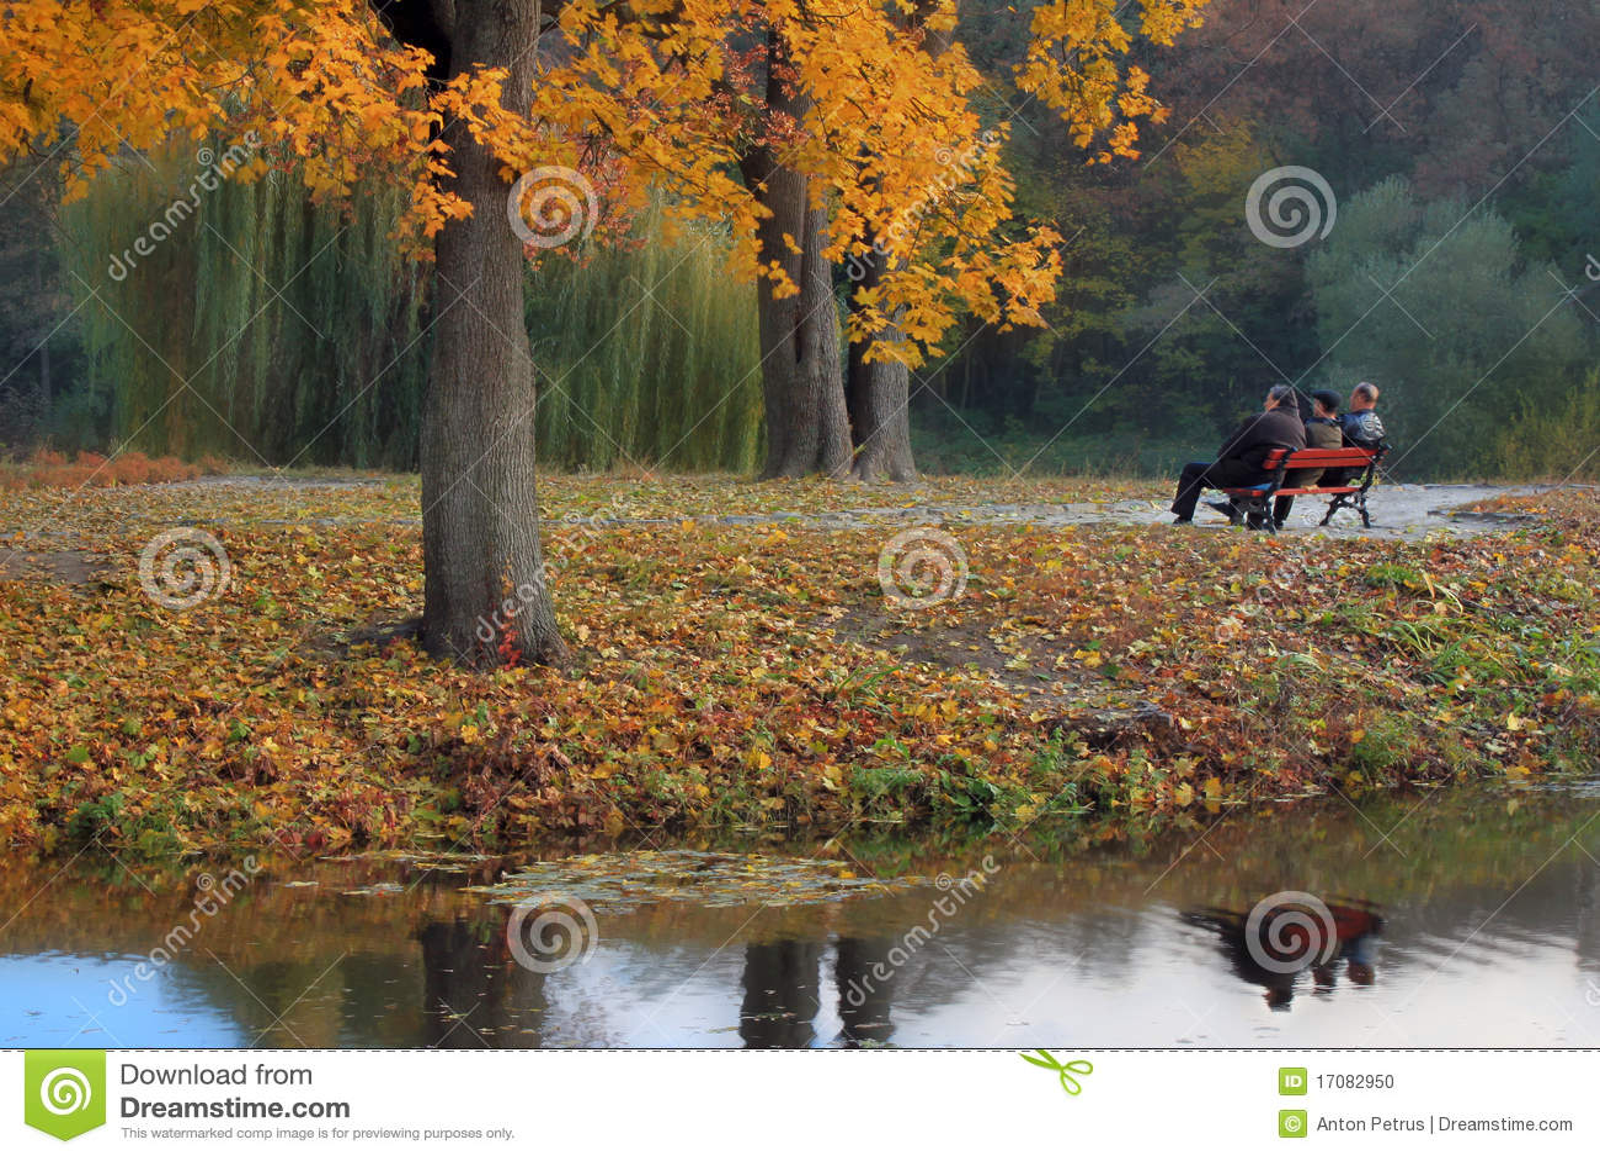 Goldene Herbstältere personen